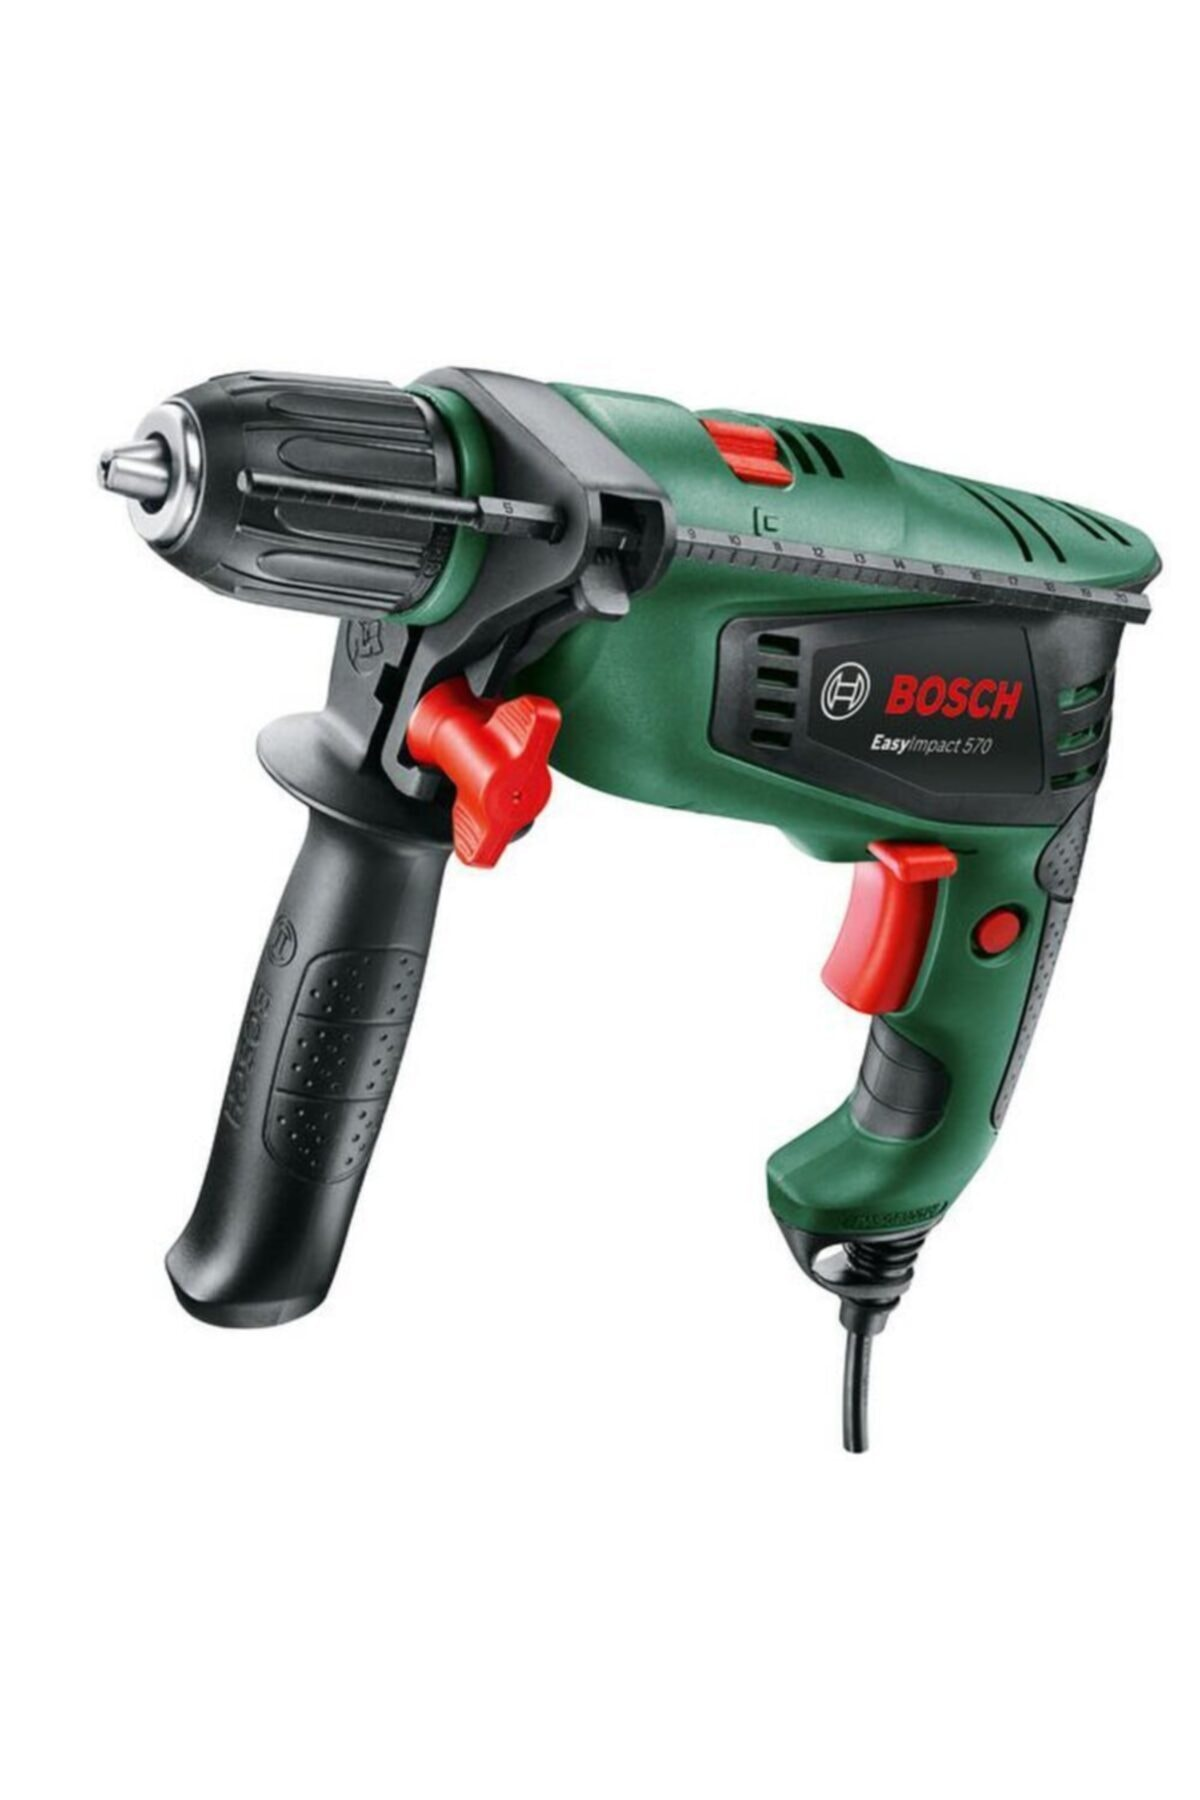 Bosch Easyımpact Darbeli Matkap 570w 1